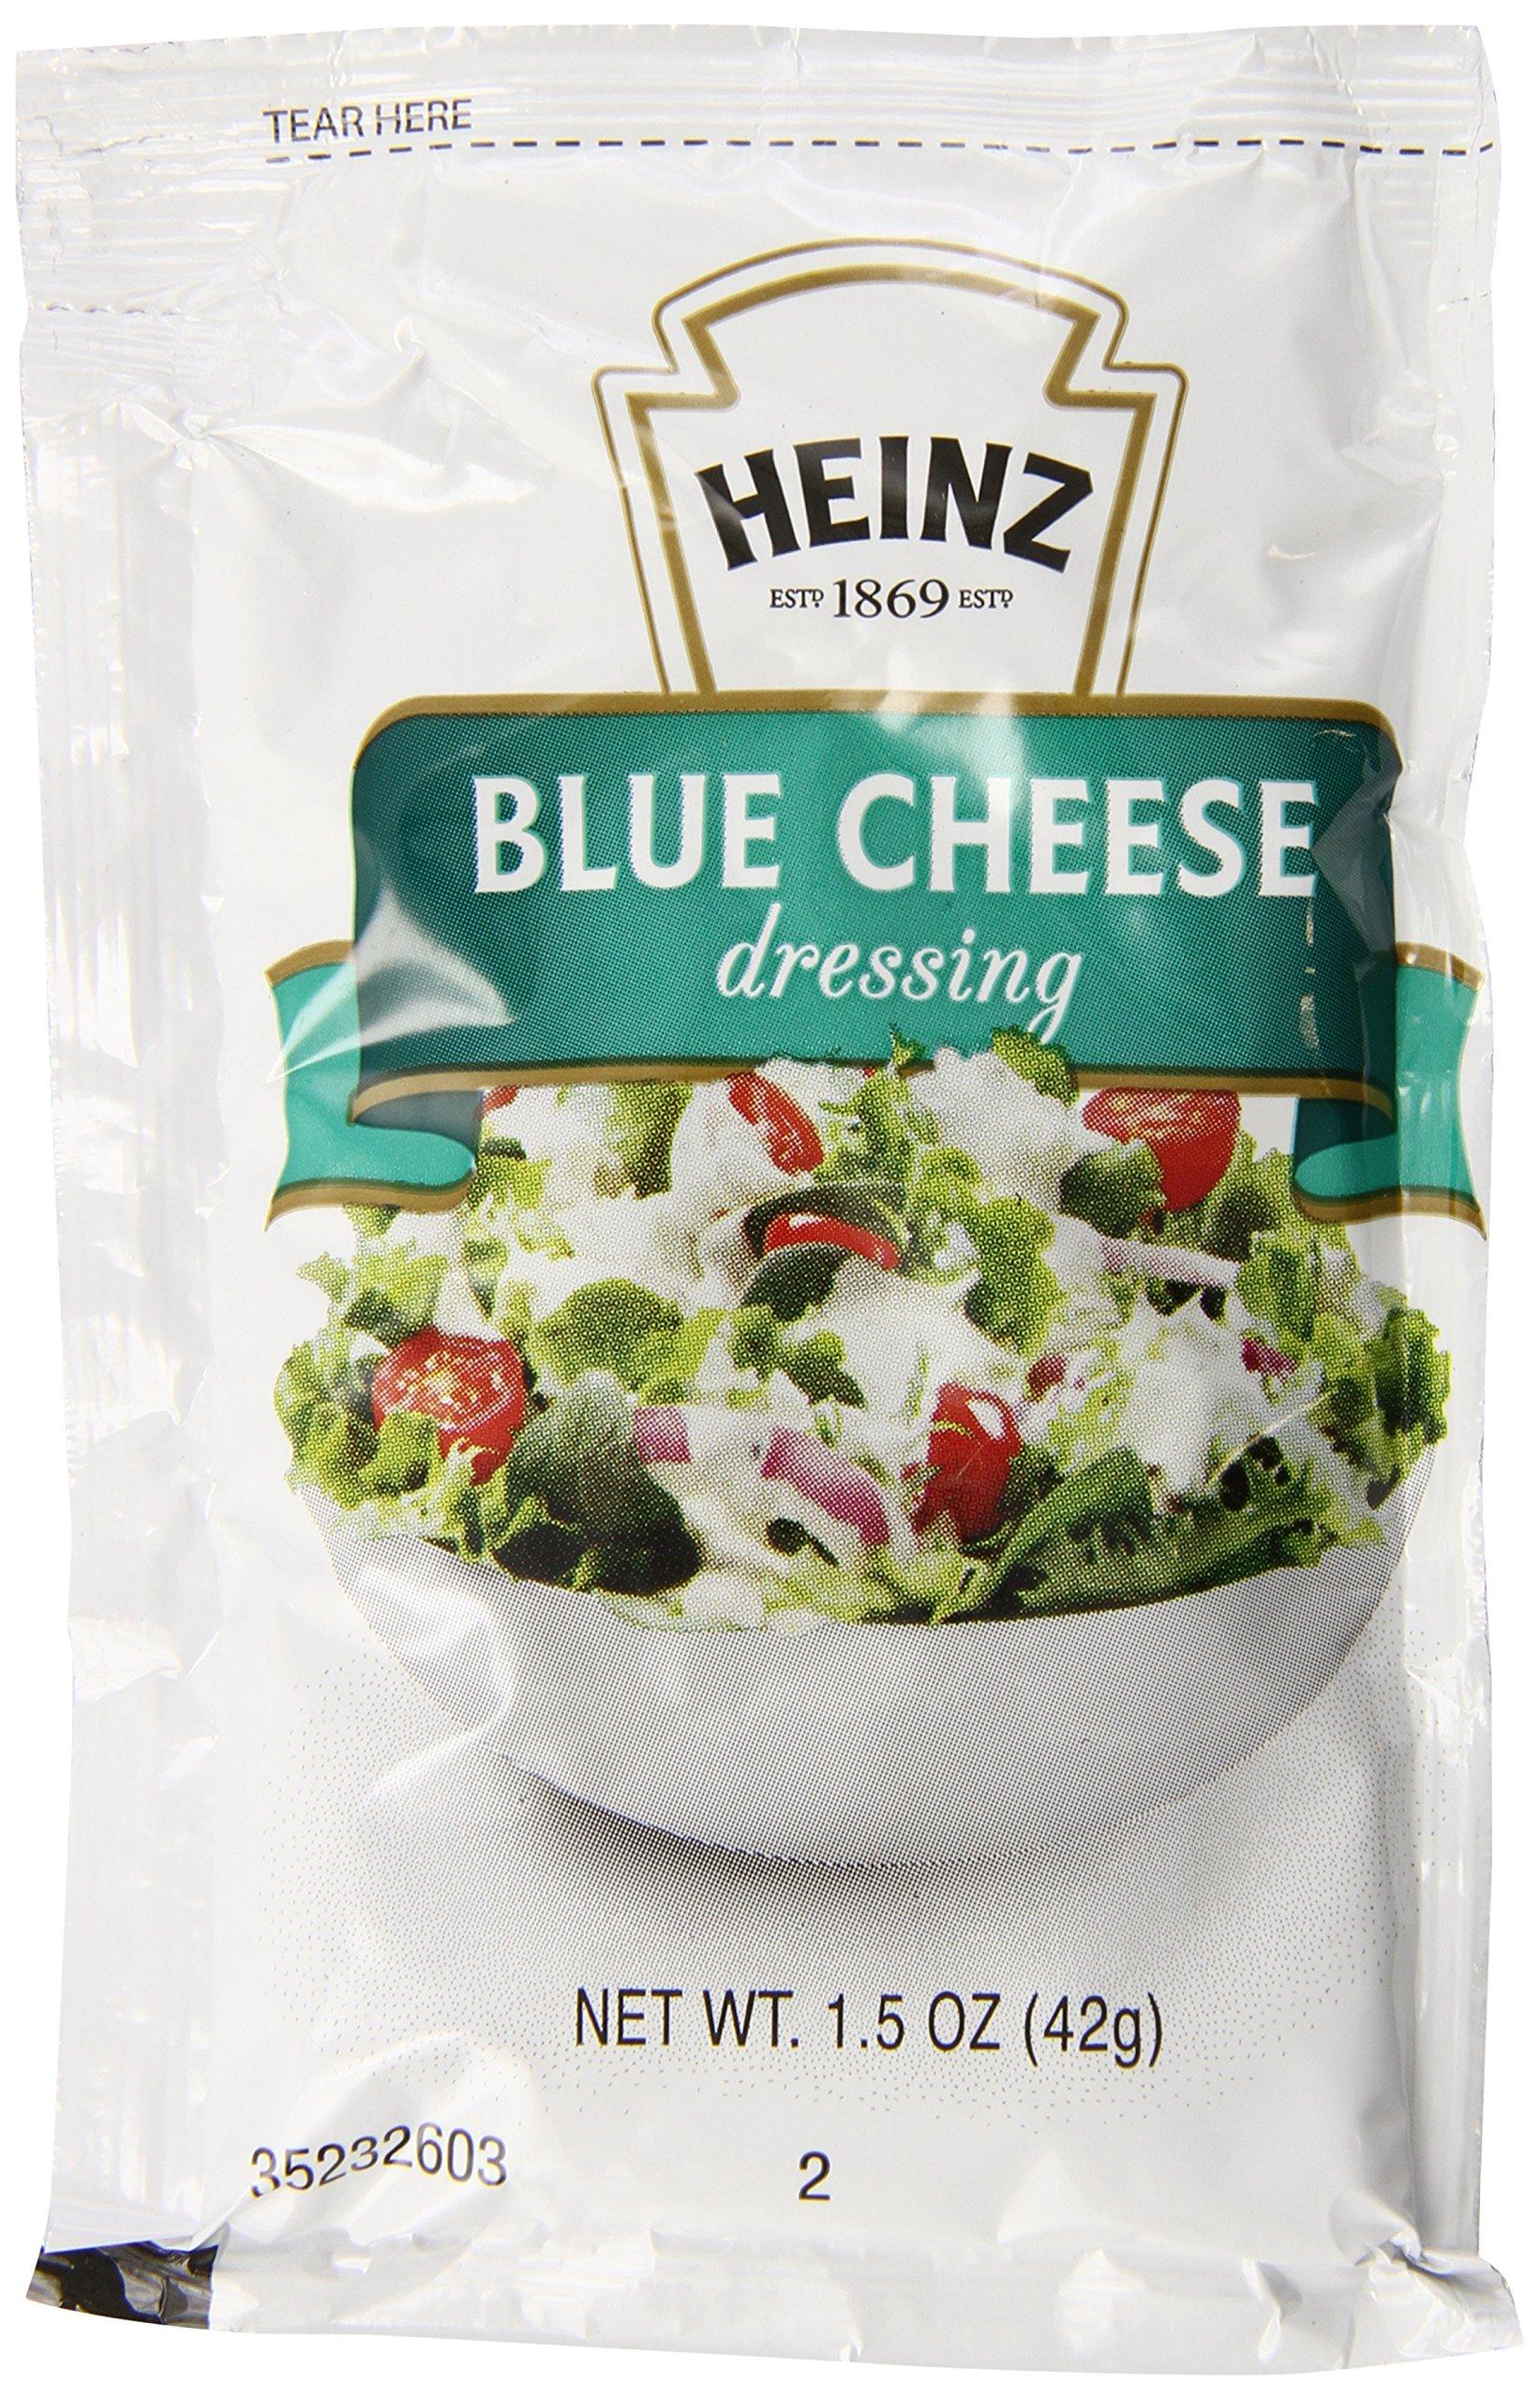 Heinz Blue Cheese Dressing, Single Serve, 1.5 oz. sachet, Pack of 60